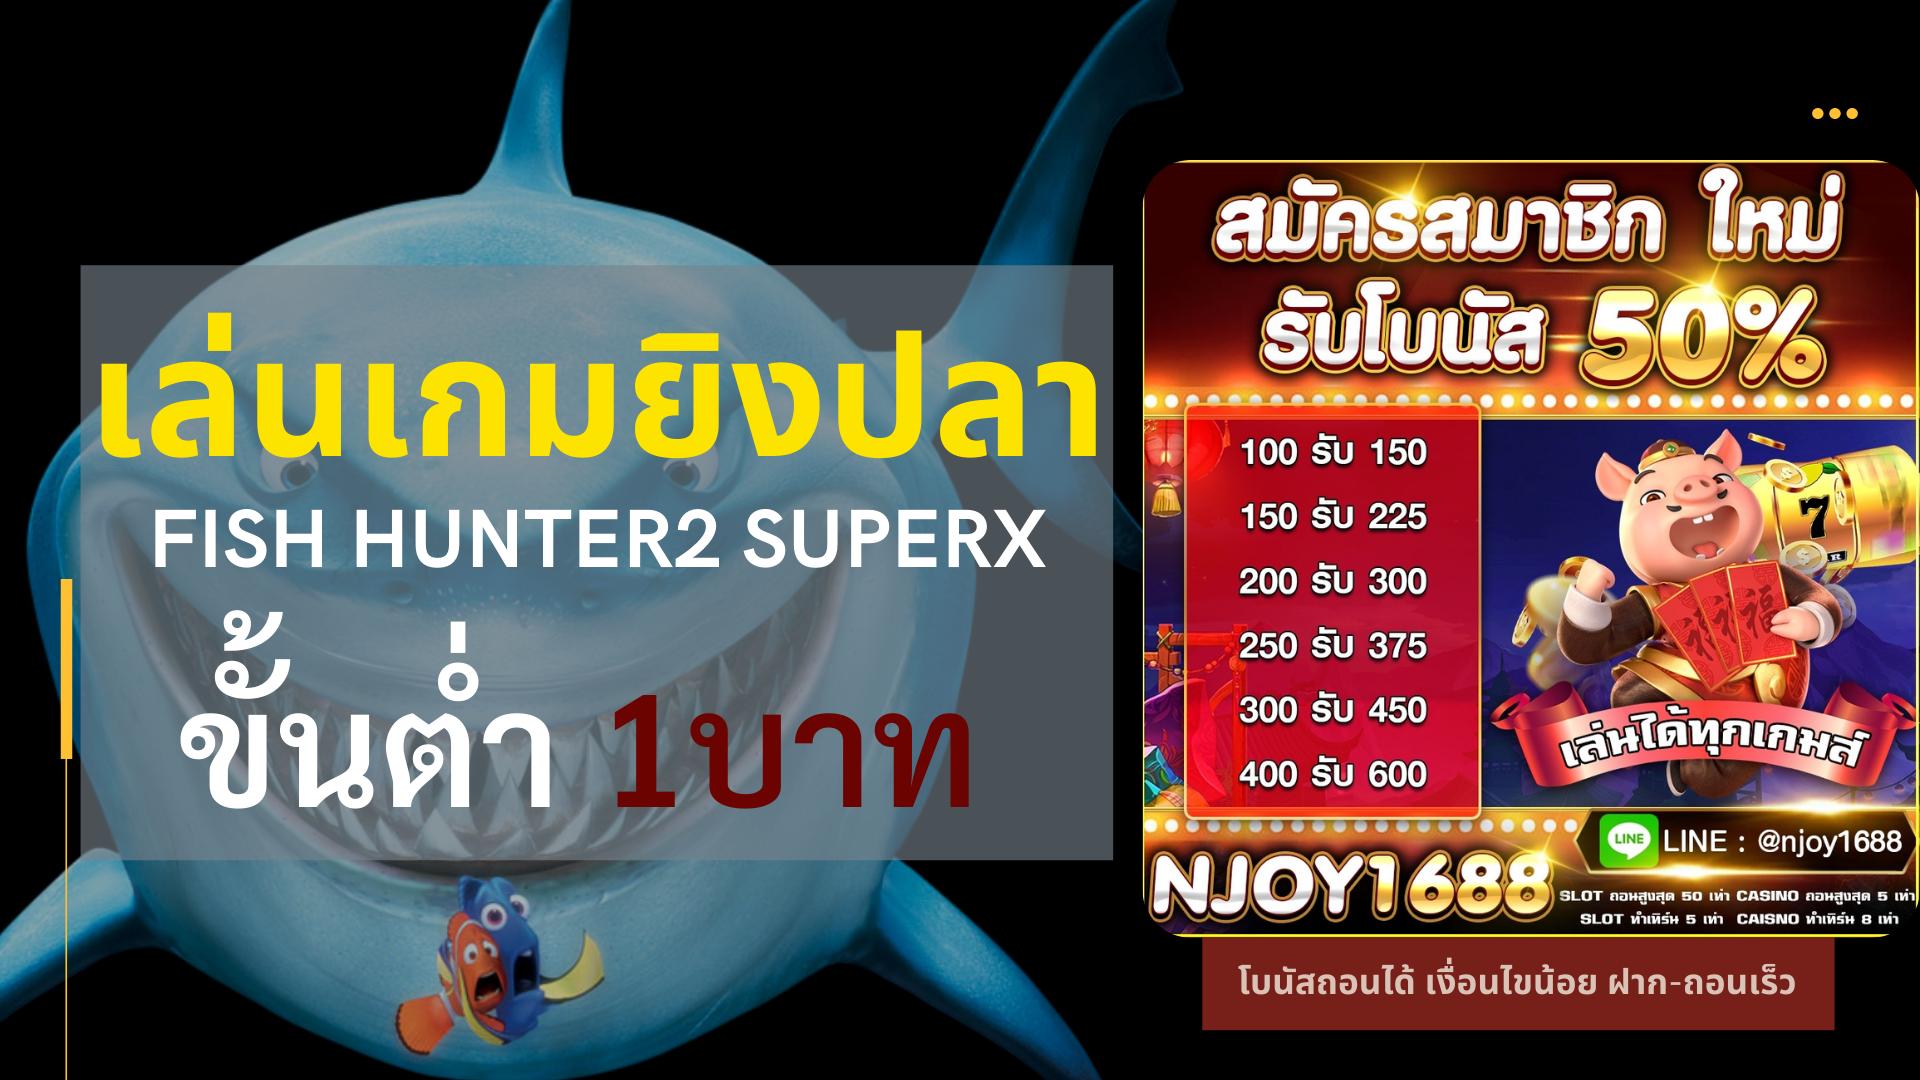 You are currently viewing เล่นเกมยิงปลา FISH HUNTER2 SUPERX เติมเงินแค่หลักสิบ